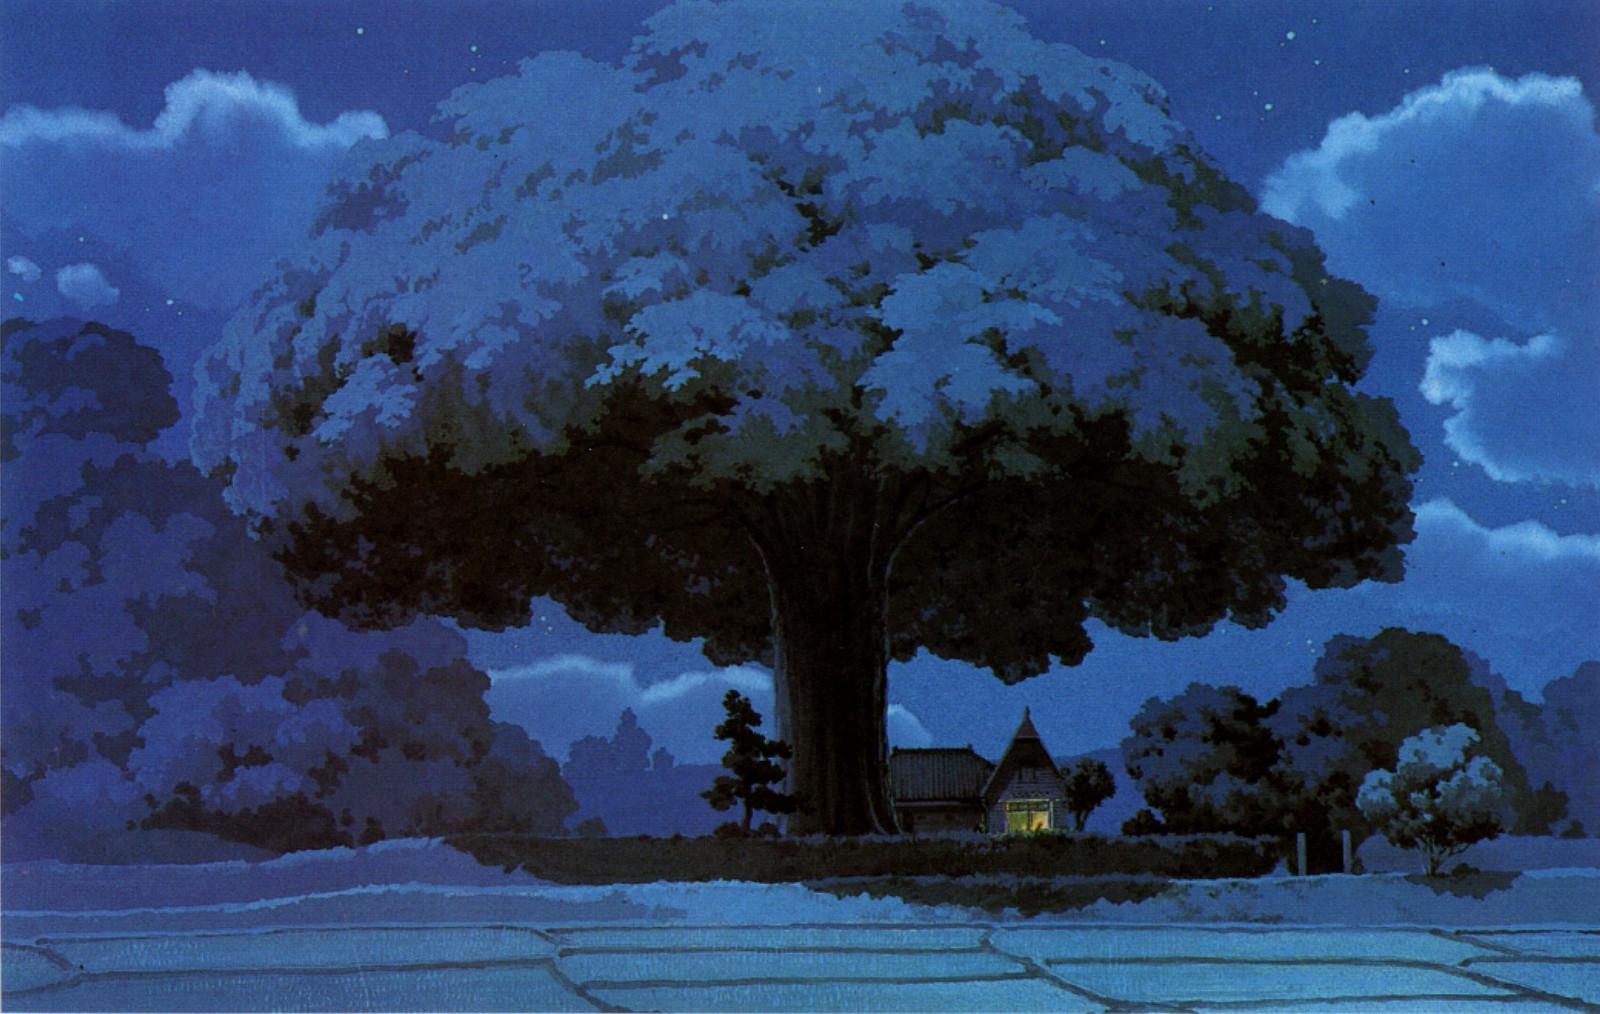 https://c.wallhere.com/photos/ed/96/2080x1319_px_anime_fantasy_Art_Studio_Ghibli_Totoro-798110.jpg!d